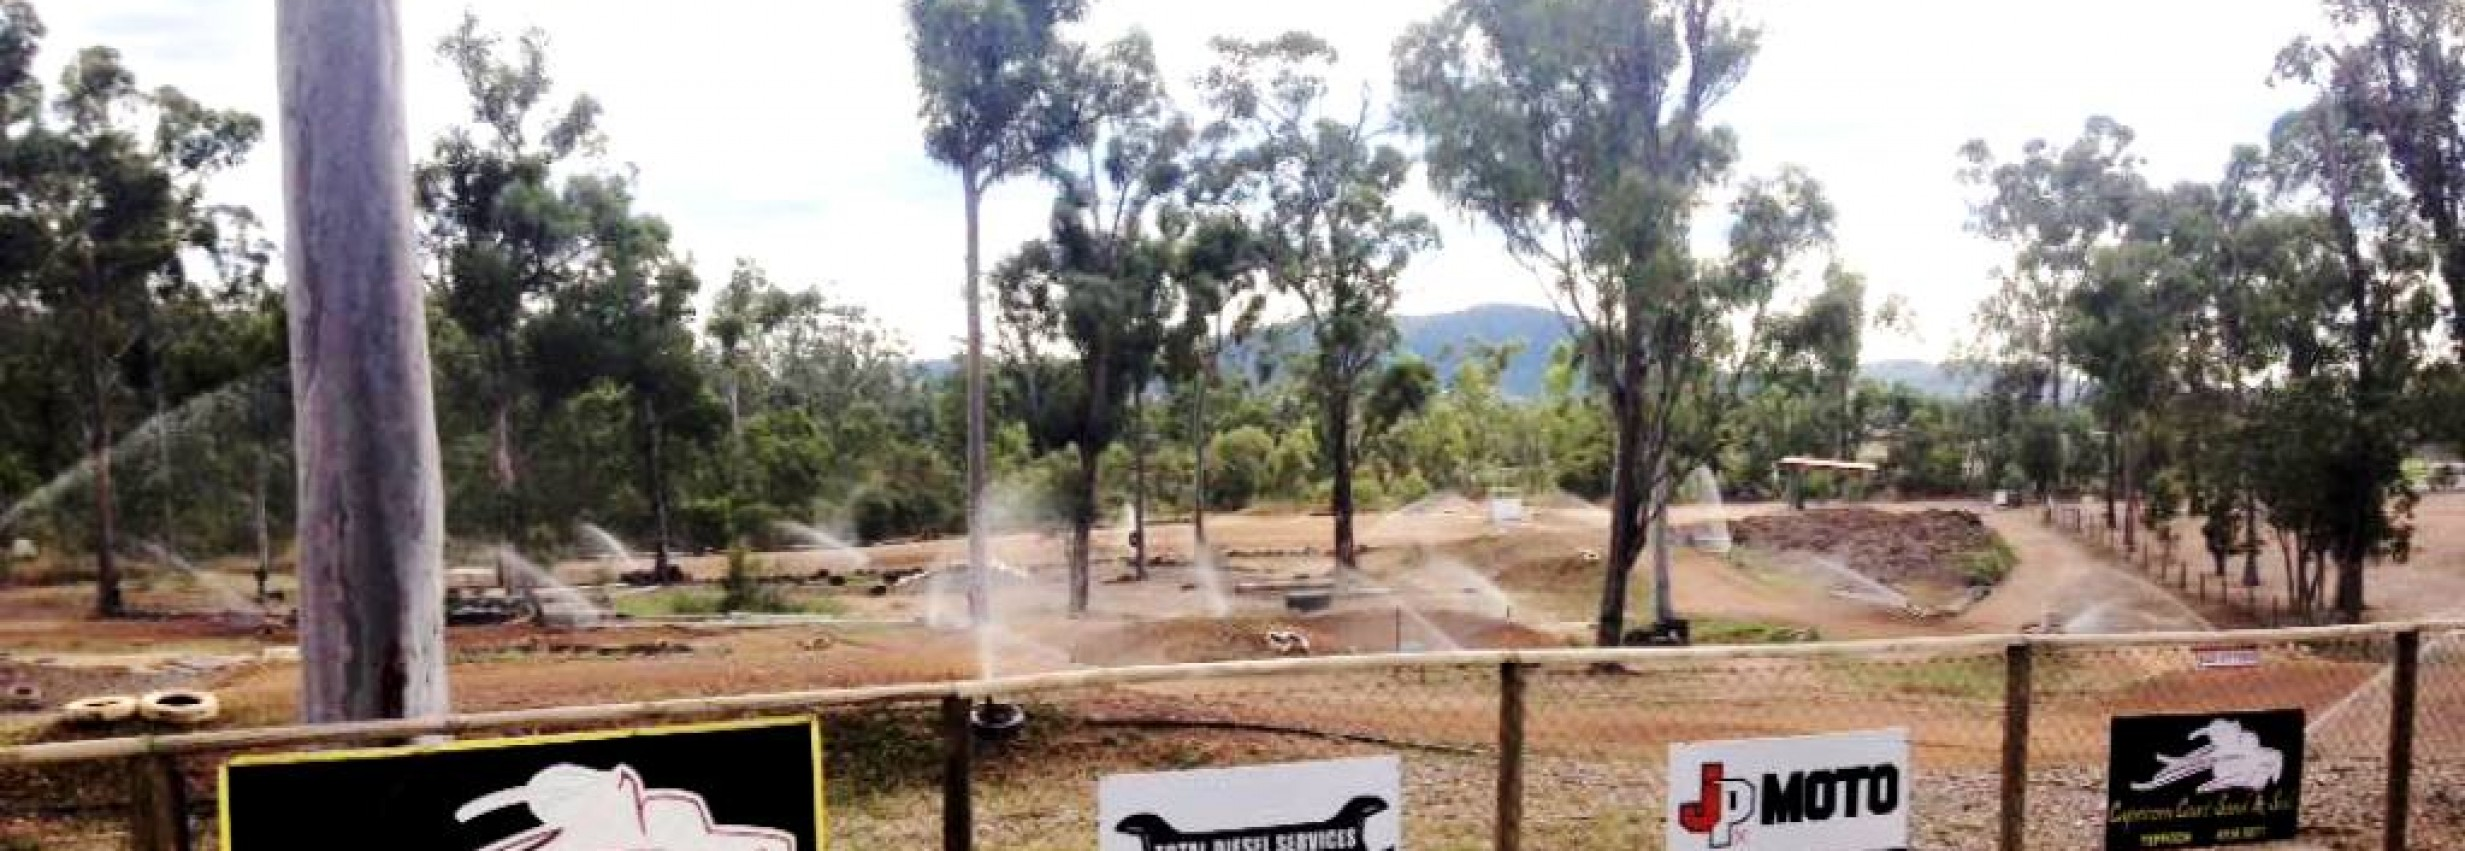 Yeppoon Motocross Track – Keppel Coast Dirt Bike Club